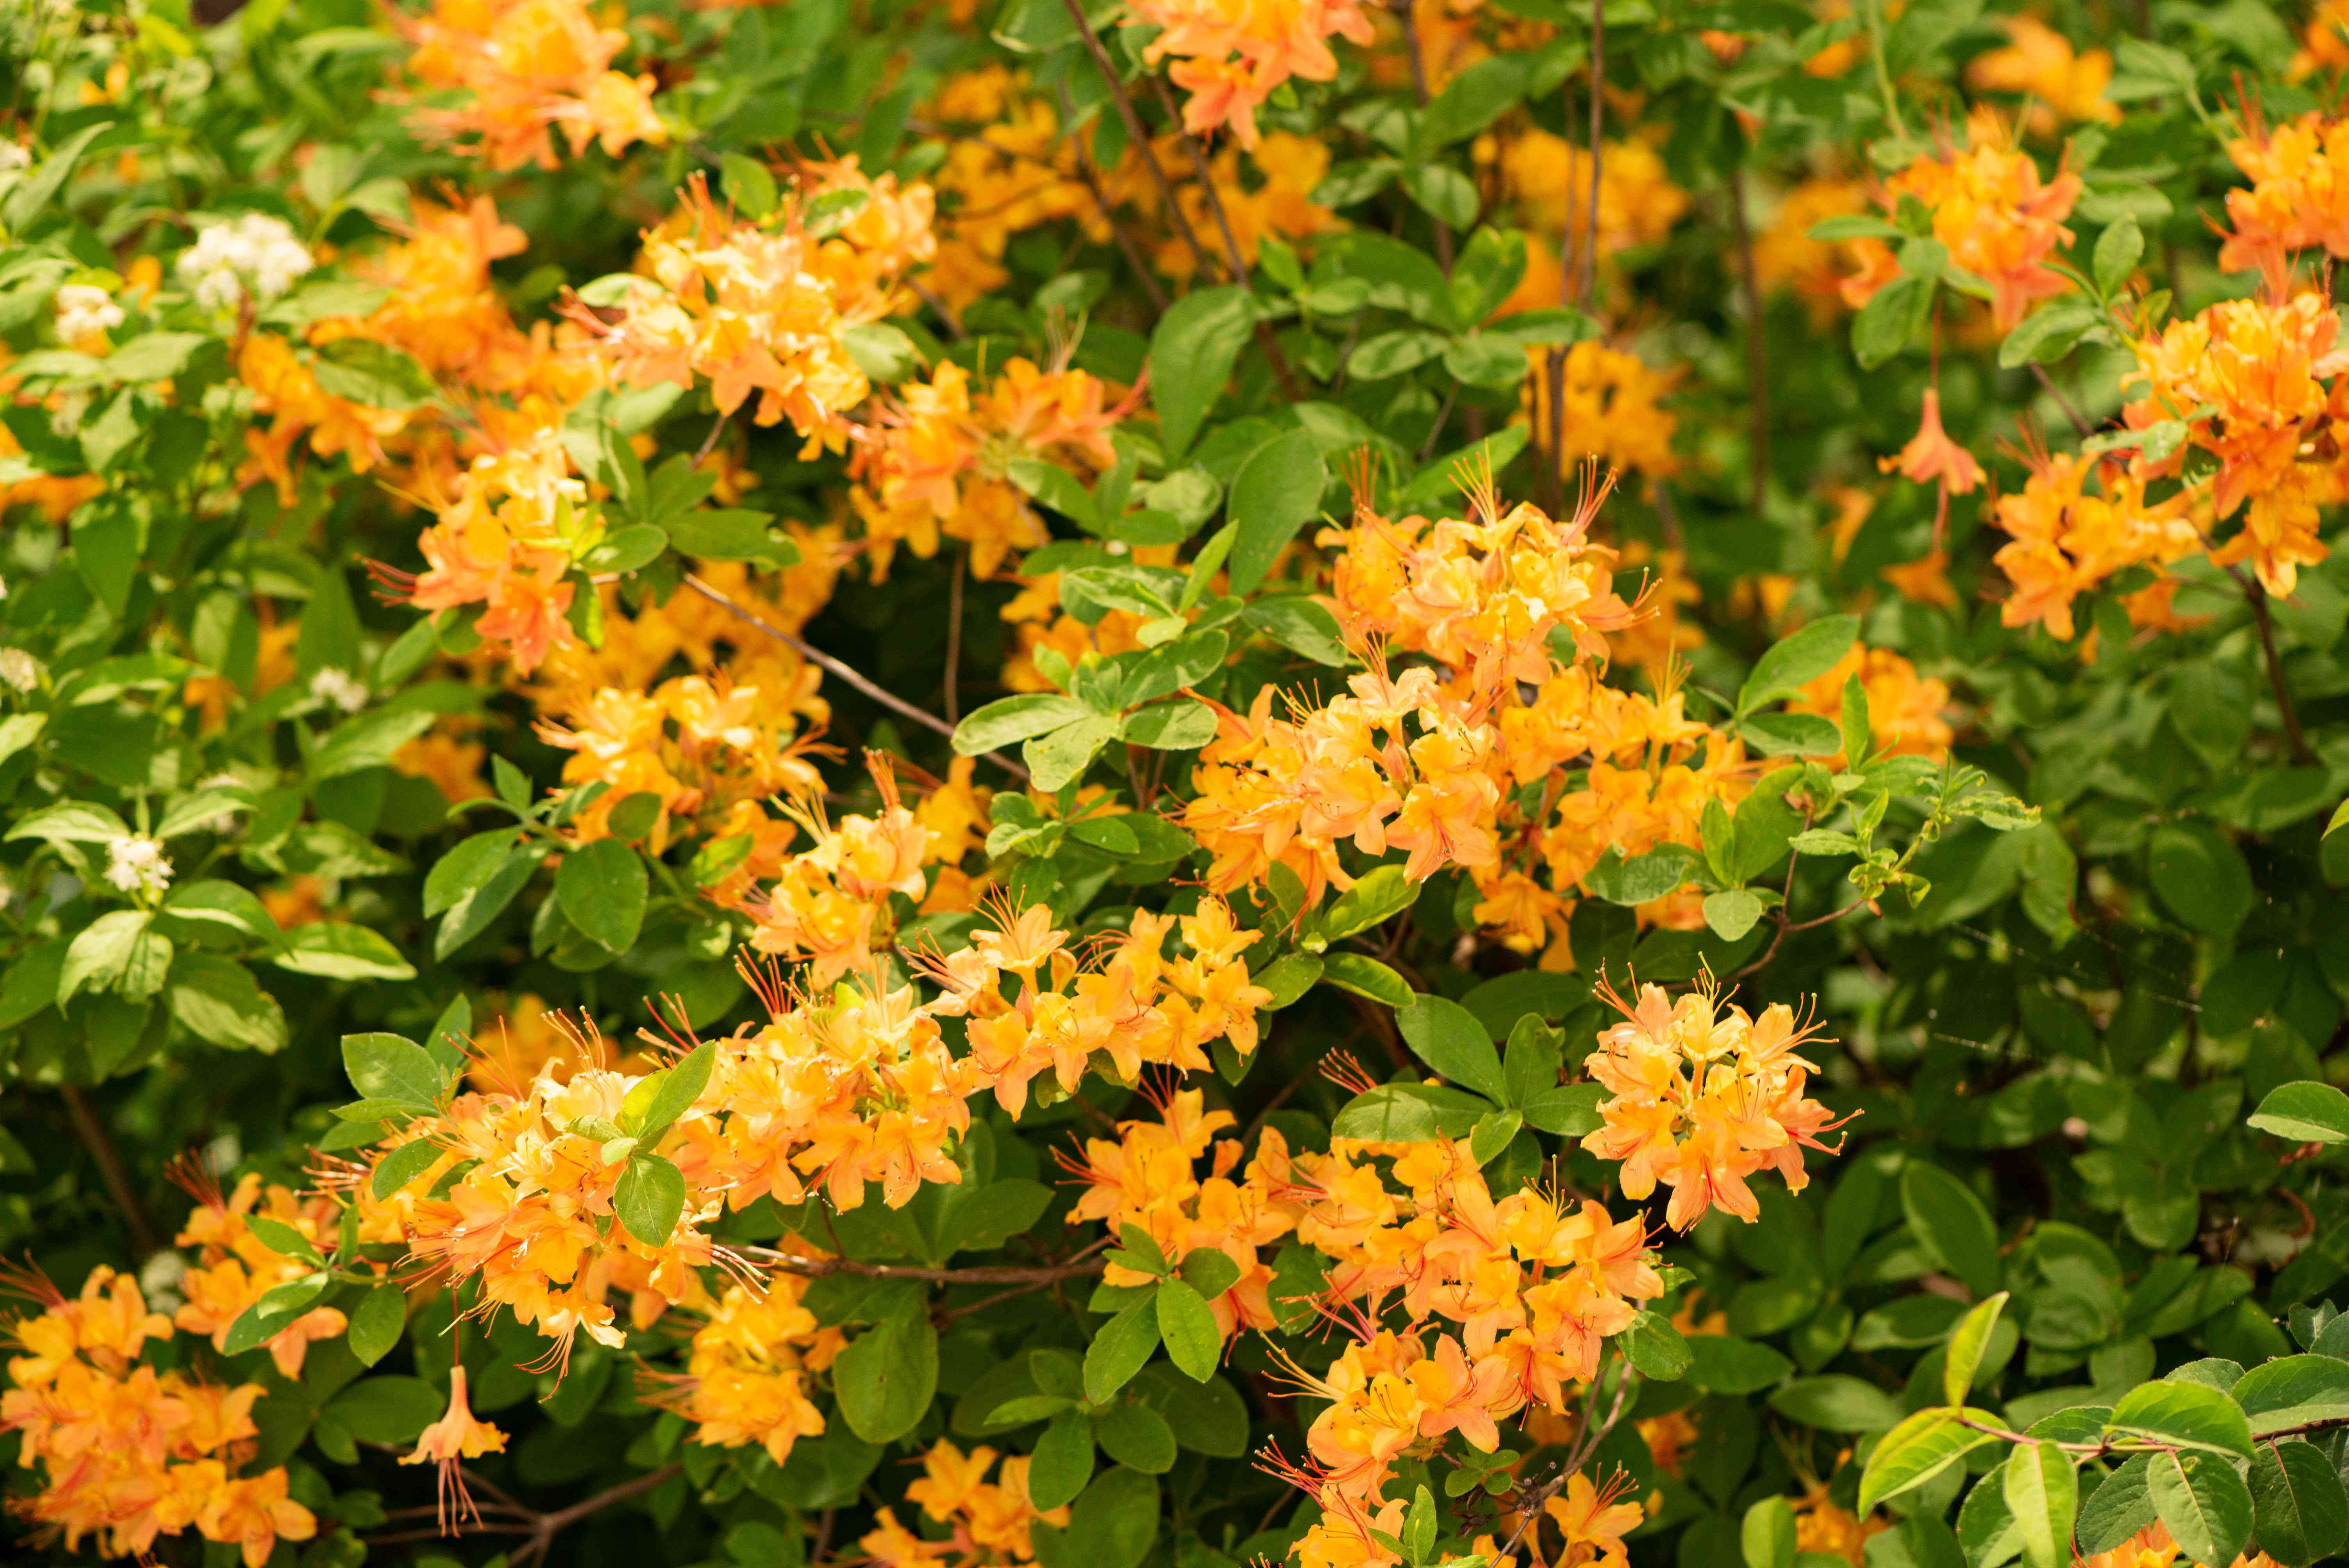 'Golden oriole' azalea bush with orange flower clusters on branches in sunlight